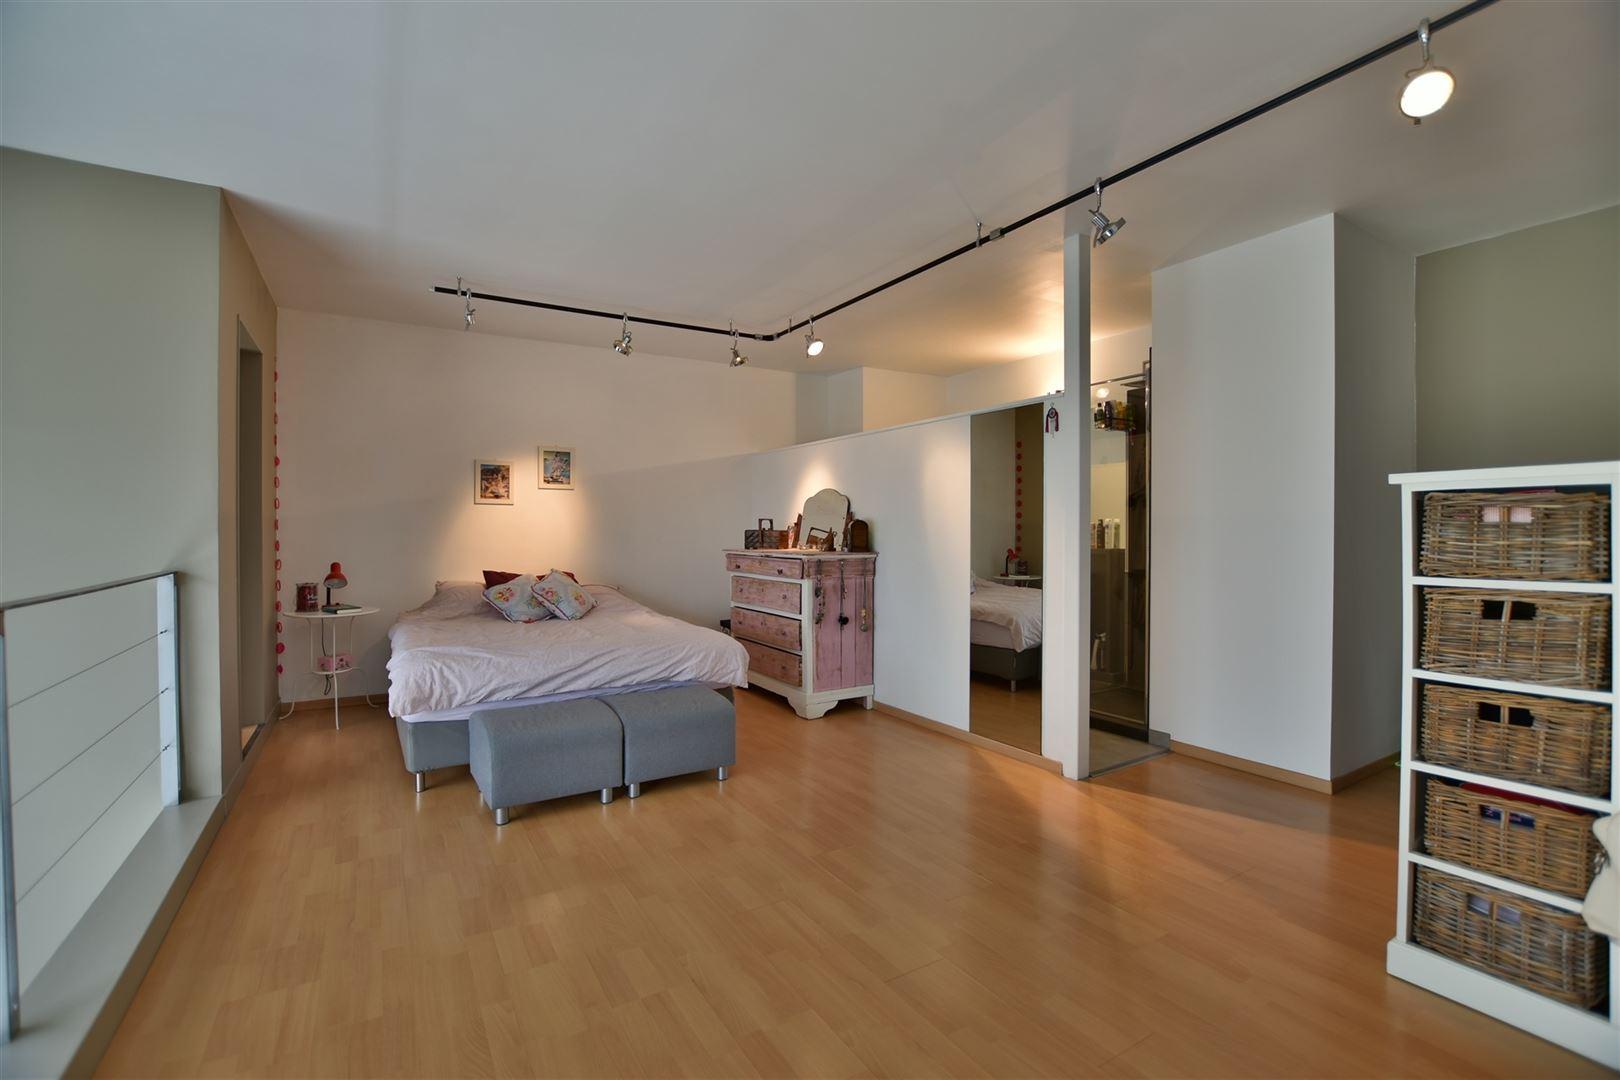 Foto 7 : Appartement te 9200 DENDERMONDE (België) - Prijs € 199.000